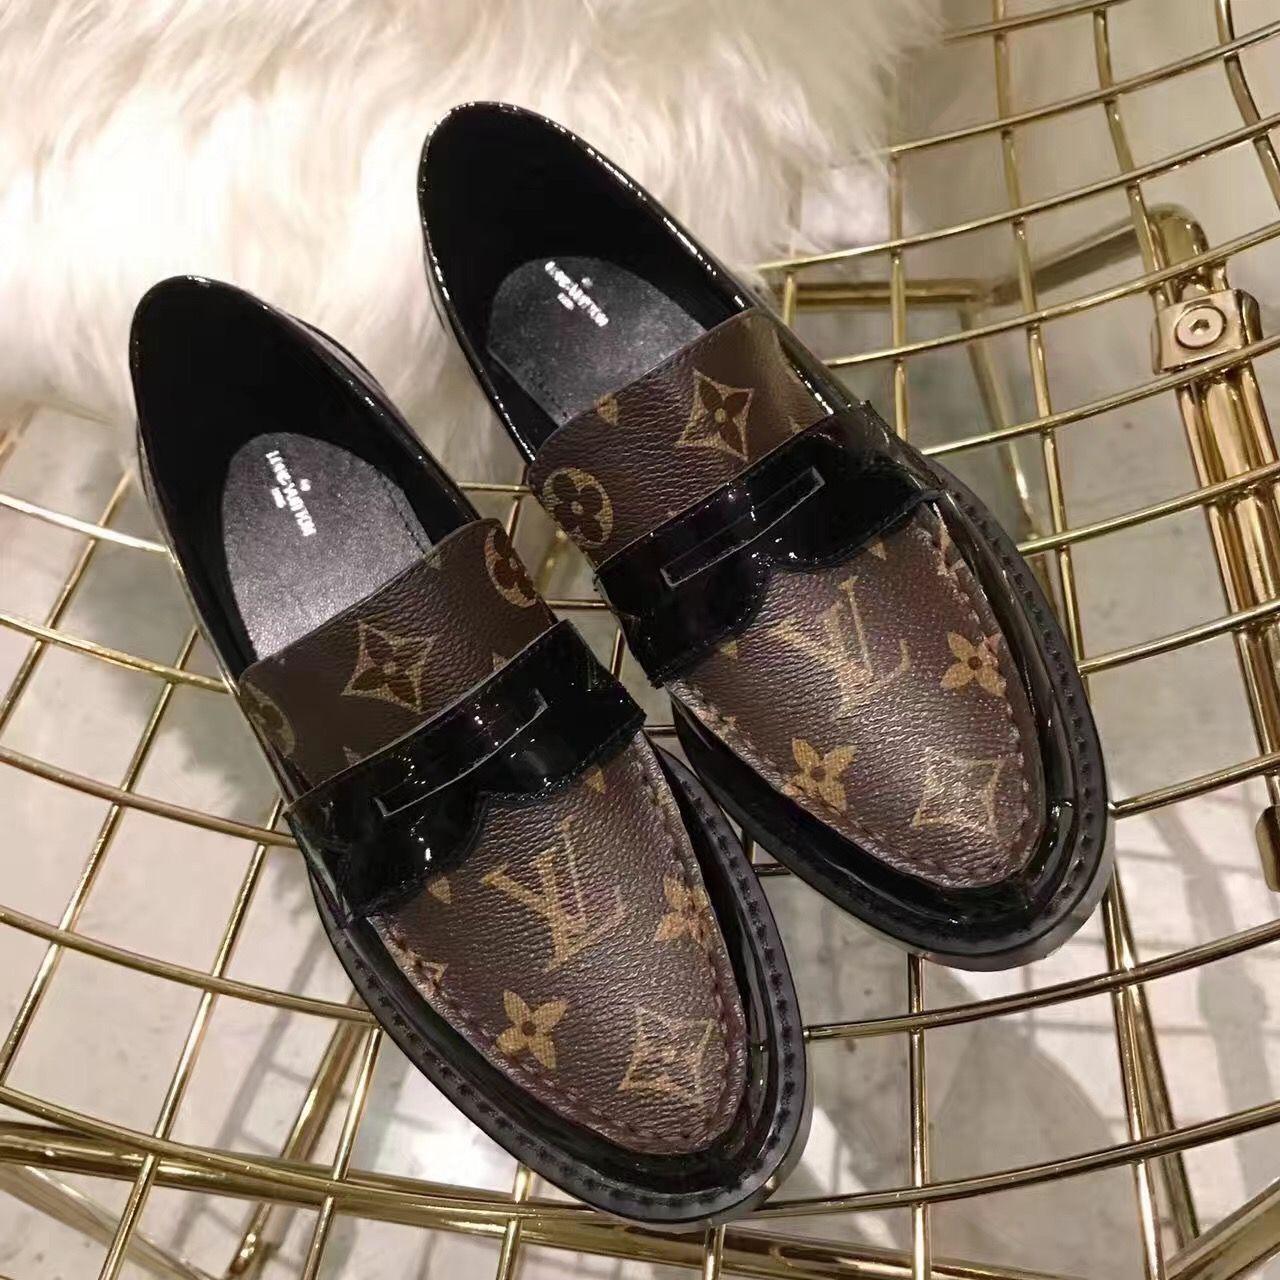 Louis Vuitton Lv Woman Shoes Leather Loafers Louis Vuitton